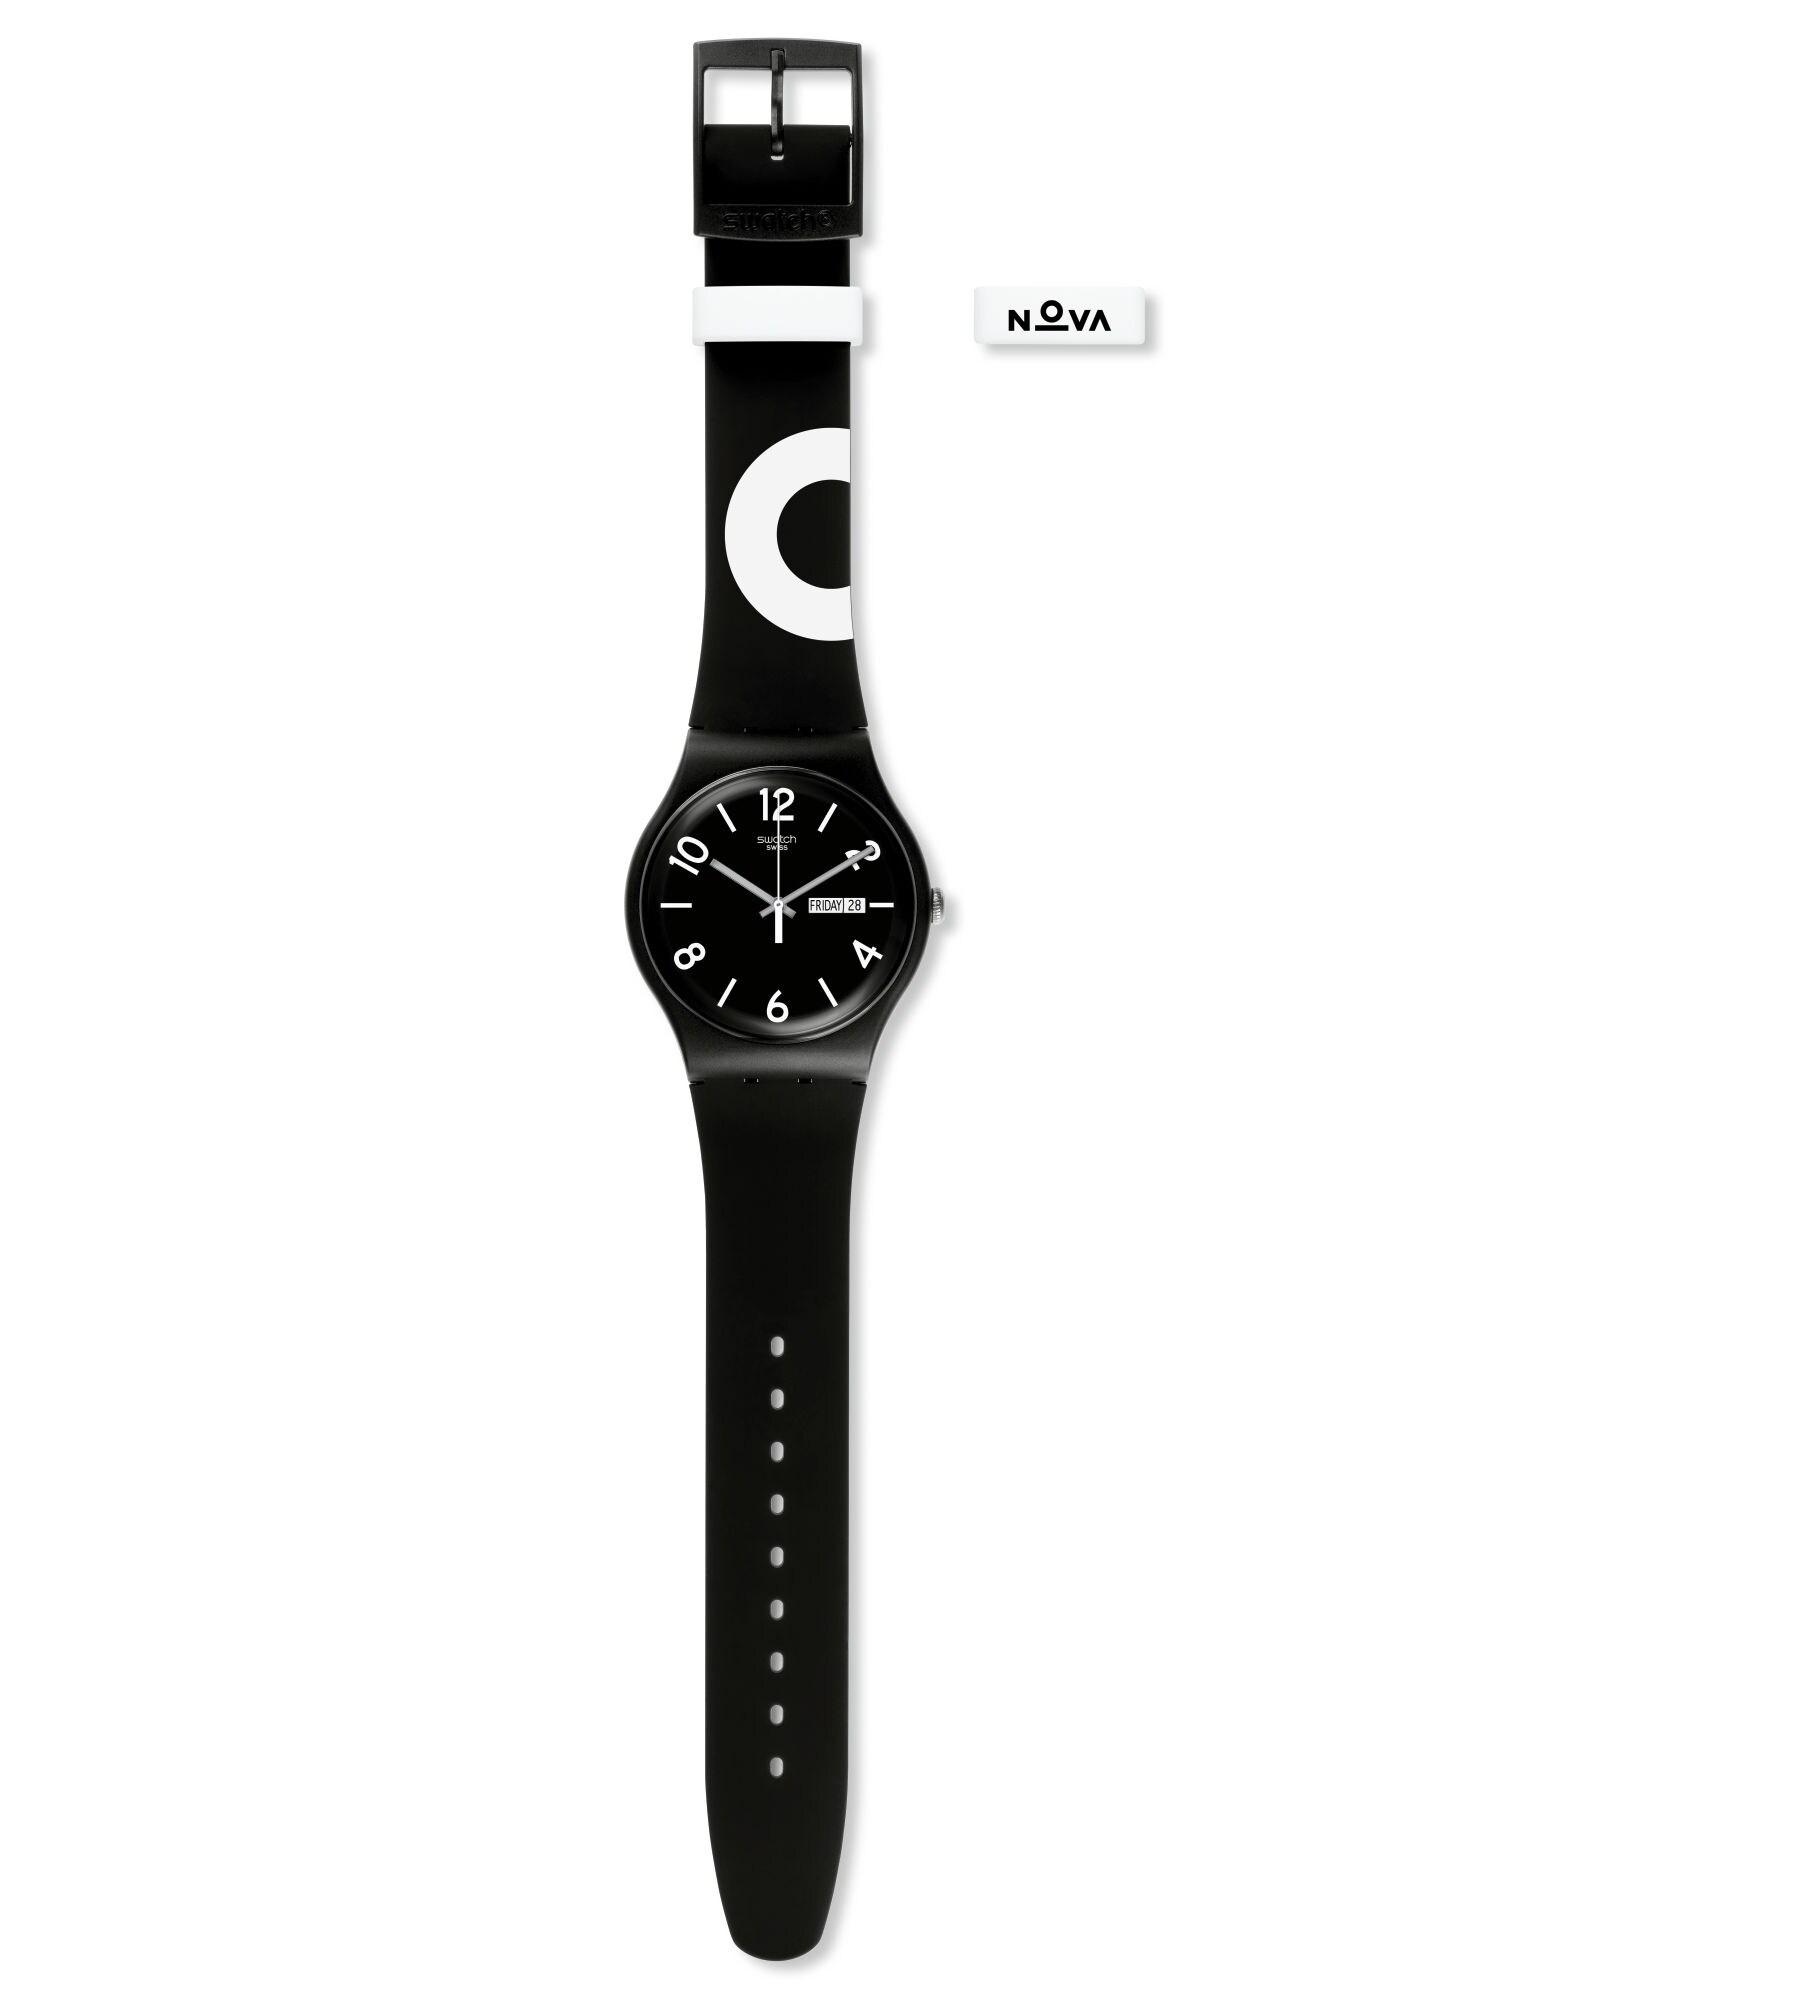 cdabc9a962d Swatch® Portugal - New Gent (Ø 41 MM) Swatch Nova SBE SUOB715E-1